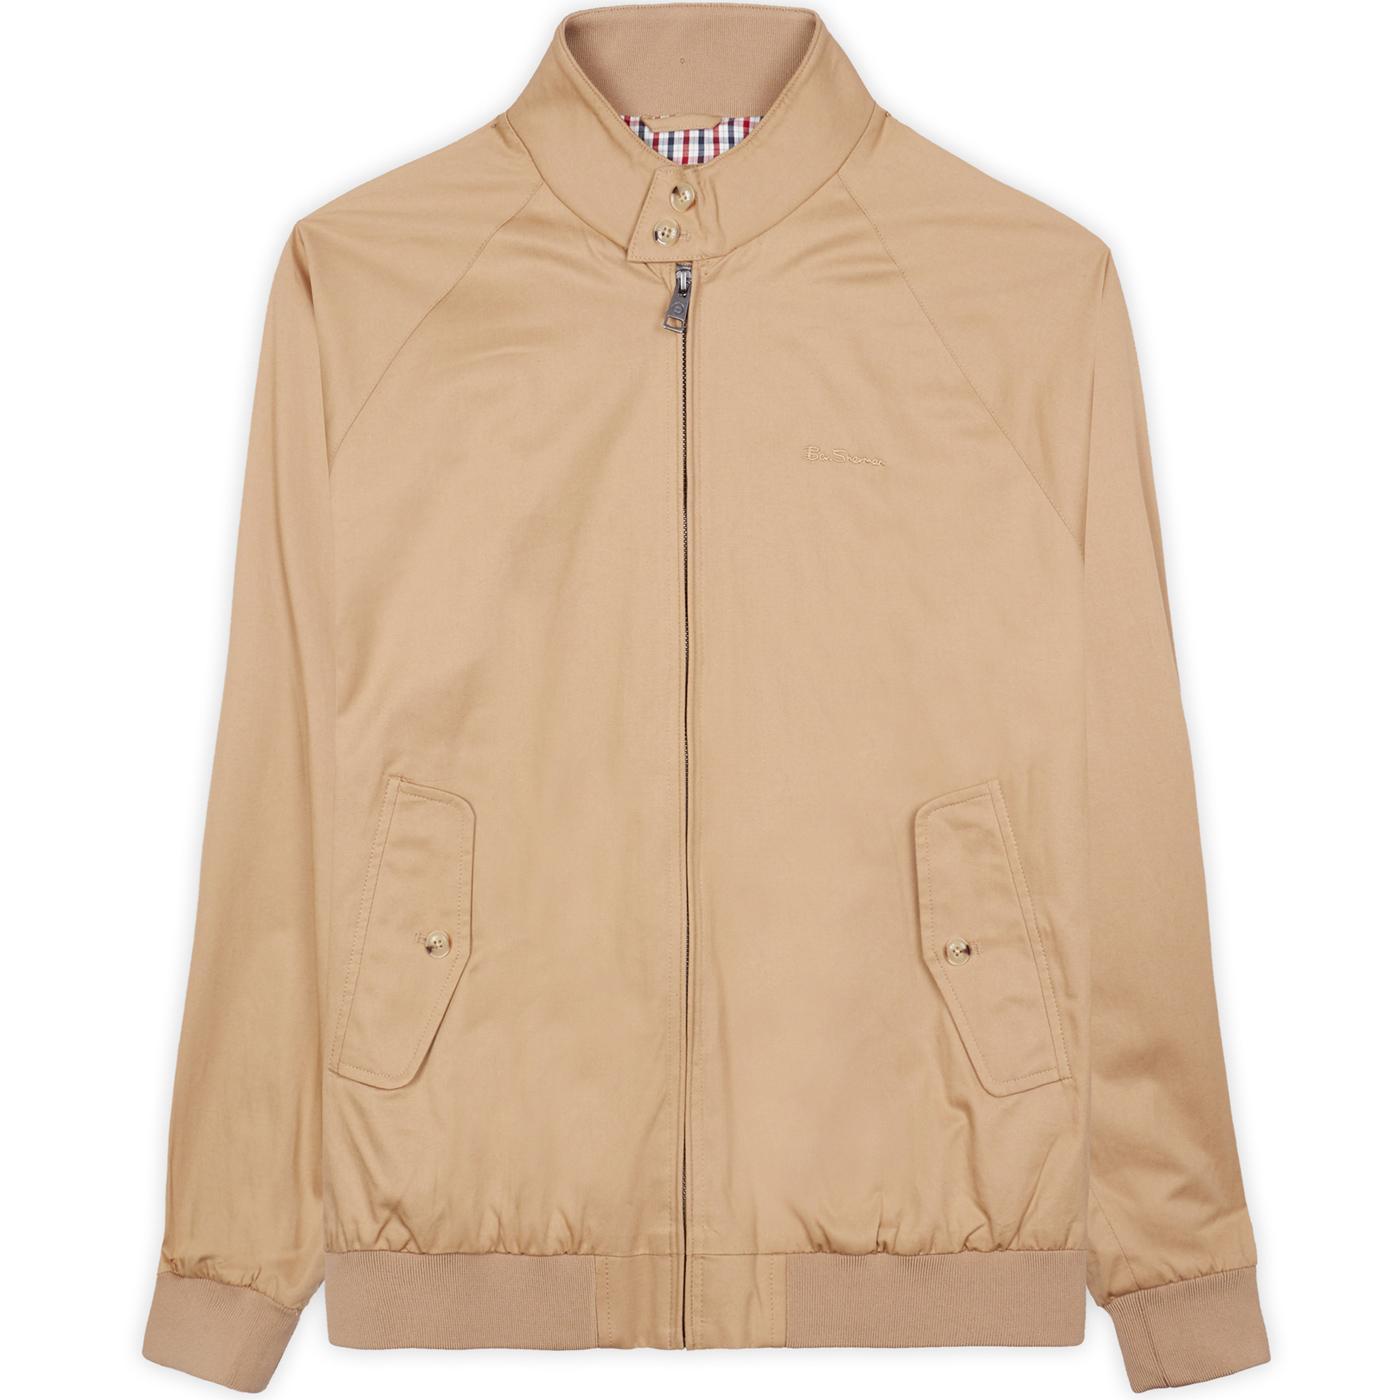 BEN SHERMAN Mod Signature Harrington Jacket (Sand)